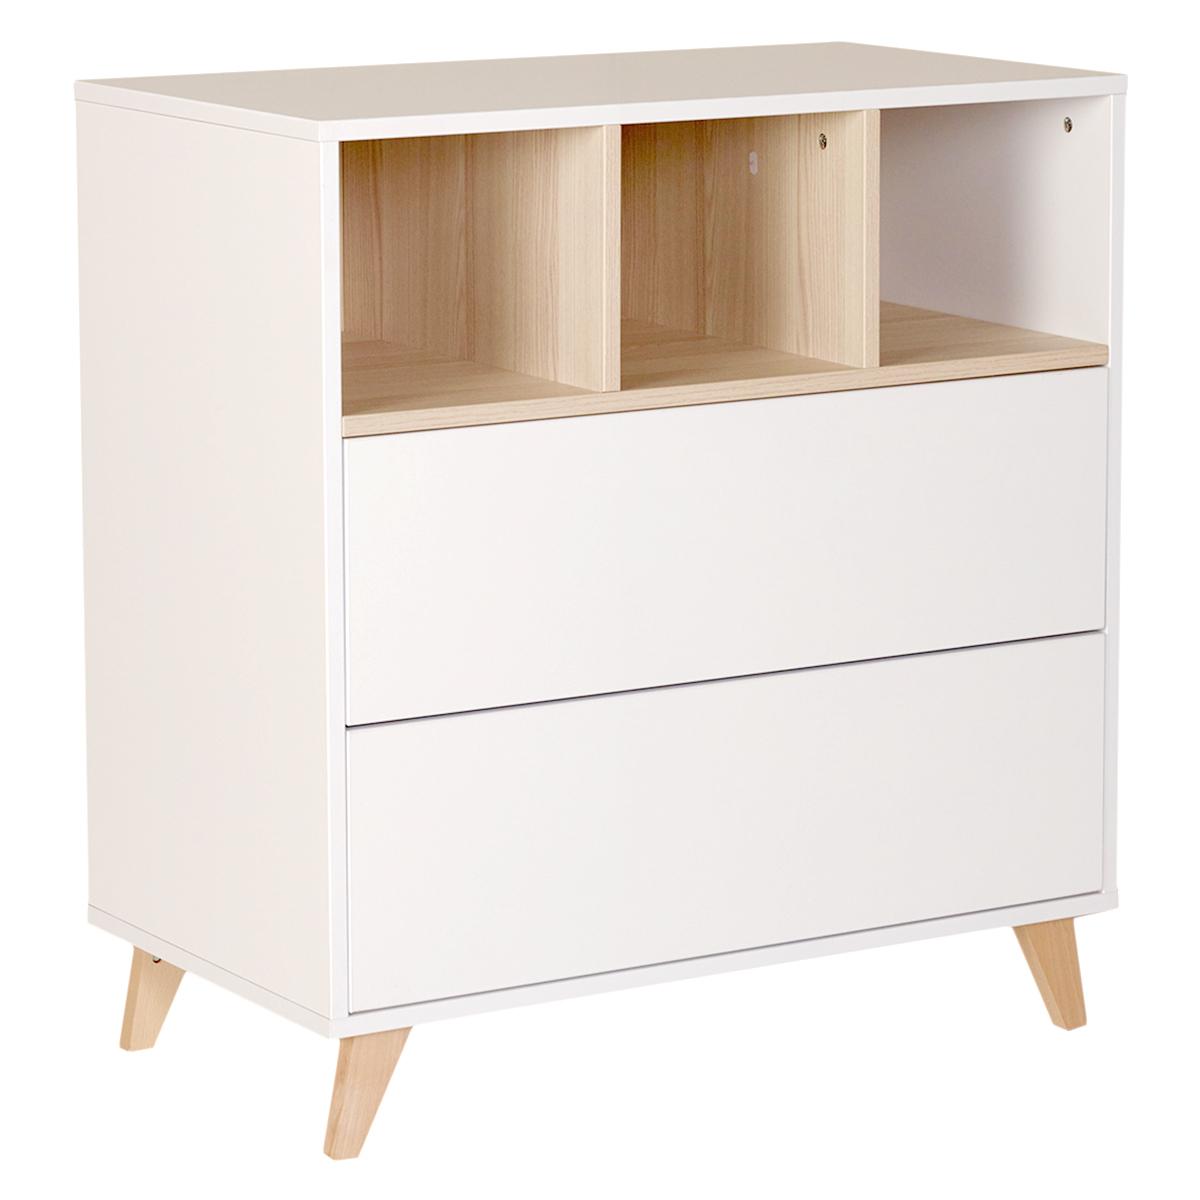 Commode Commode Loft - White Commode Loft - White